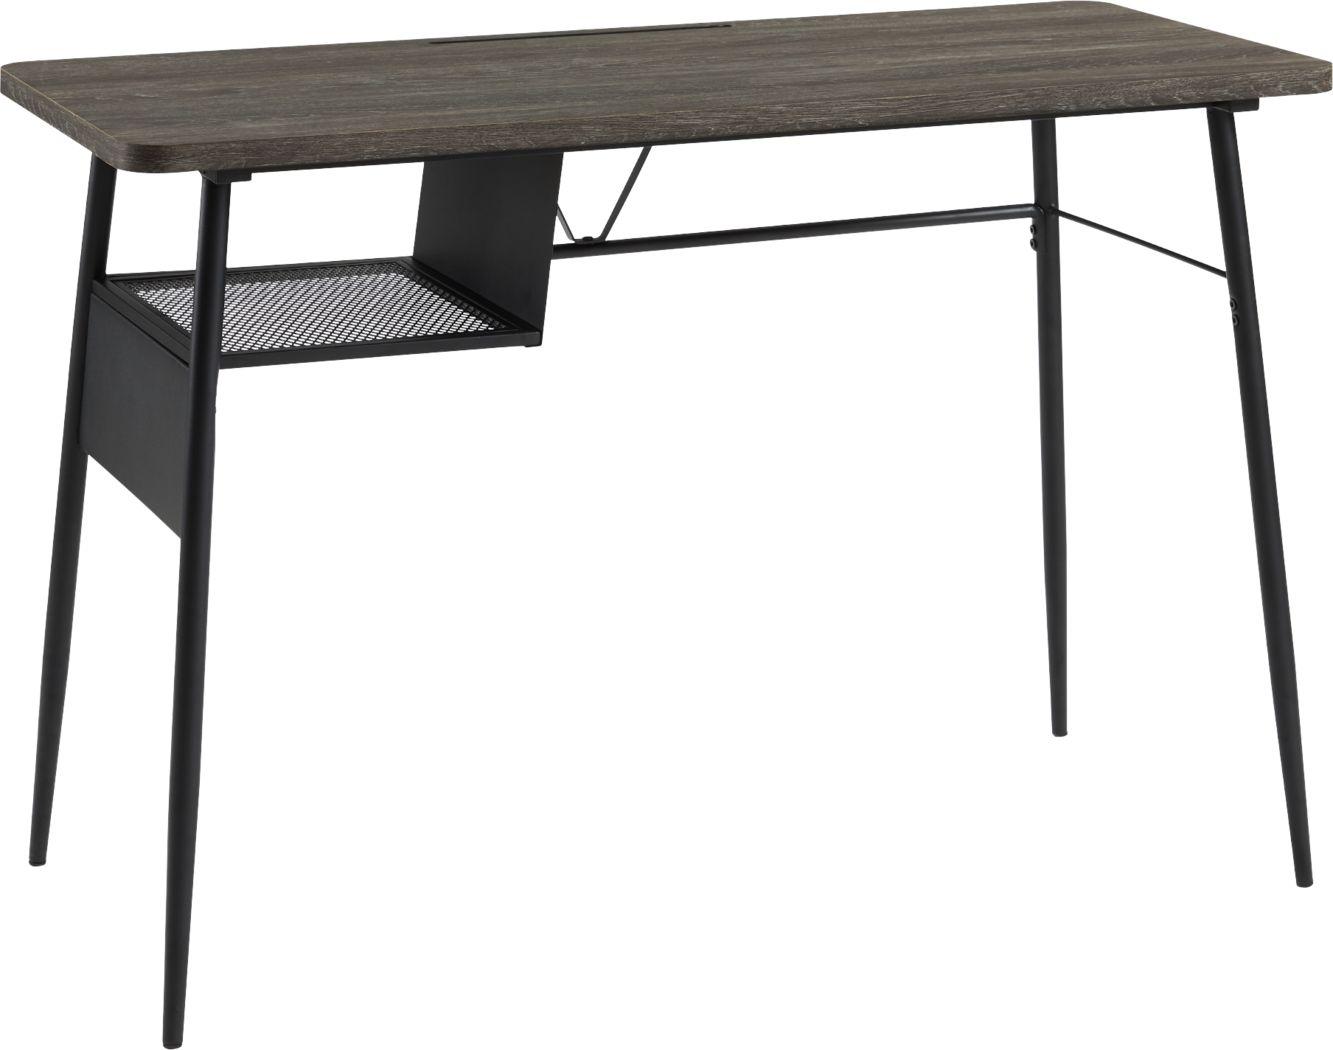 Dillenbeck Ash Desk